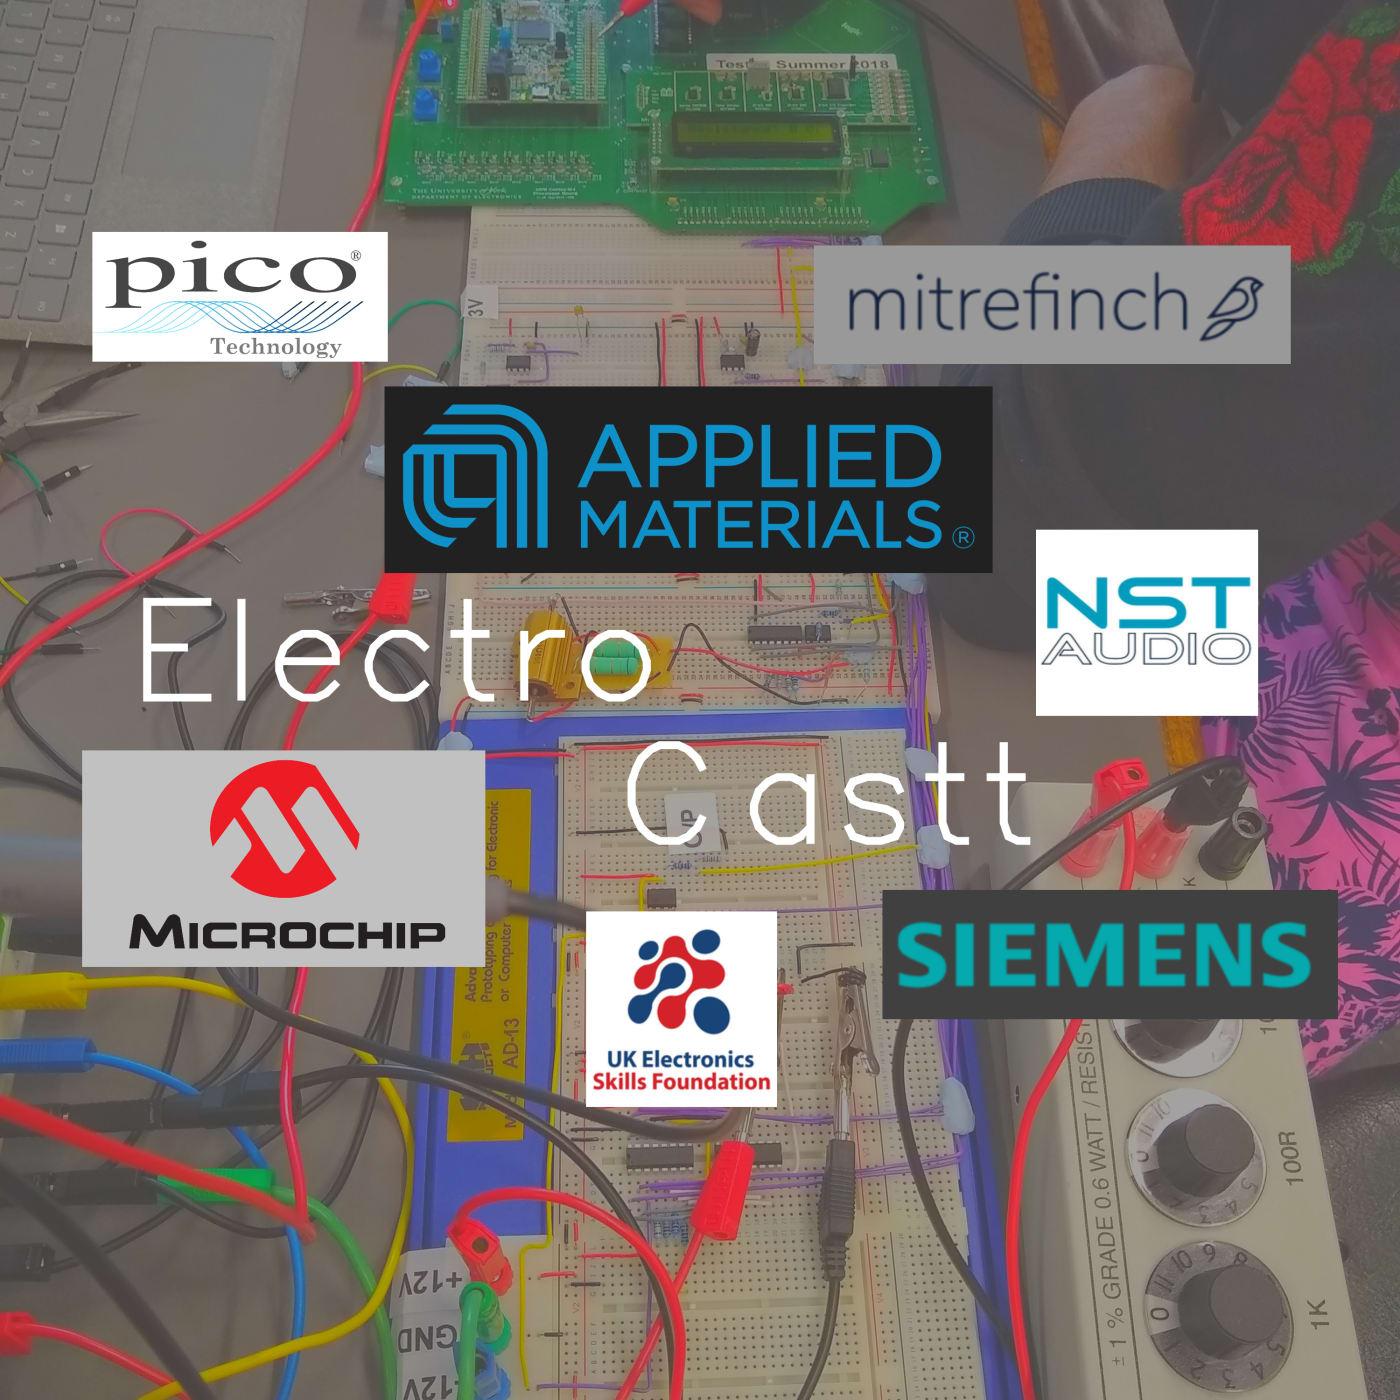 ElectroCastt - Participating suppliers